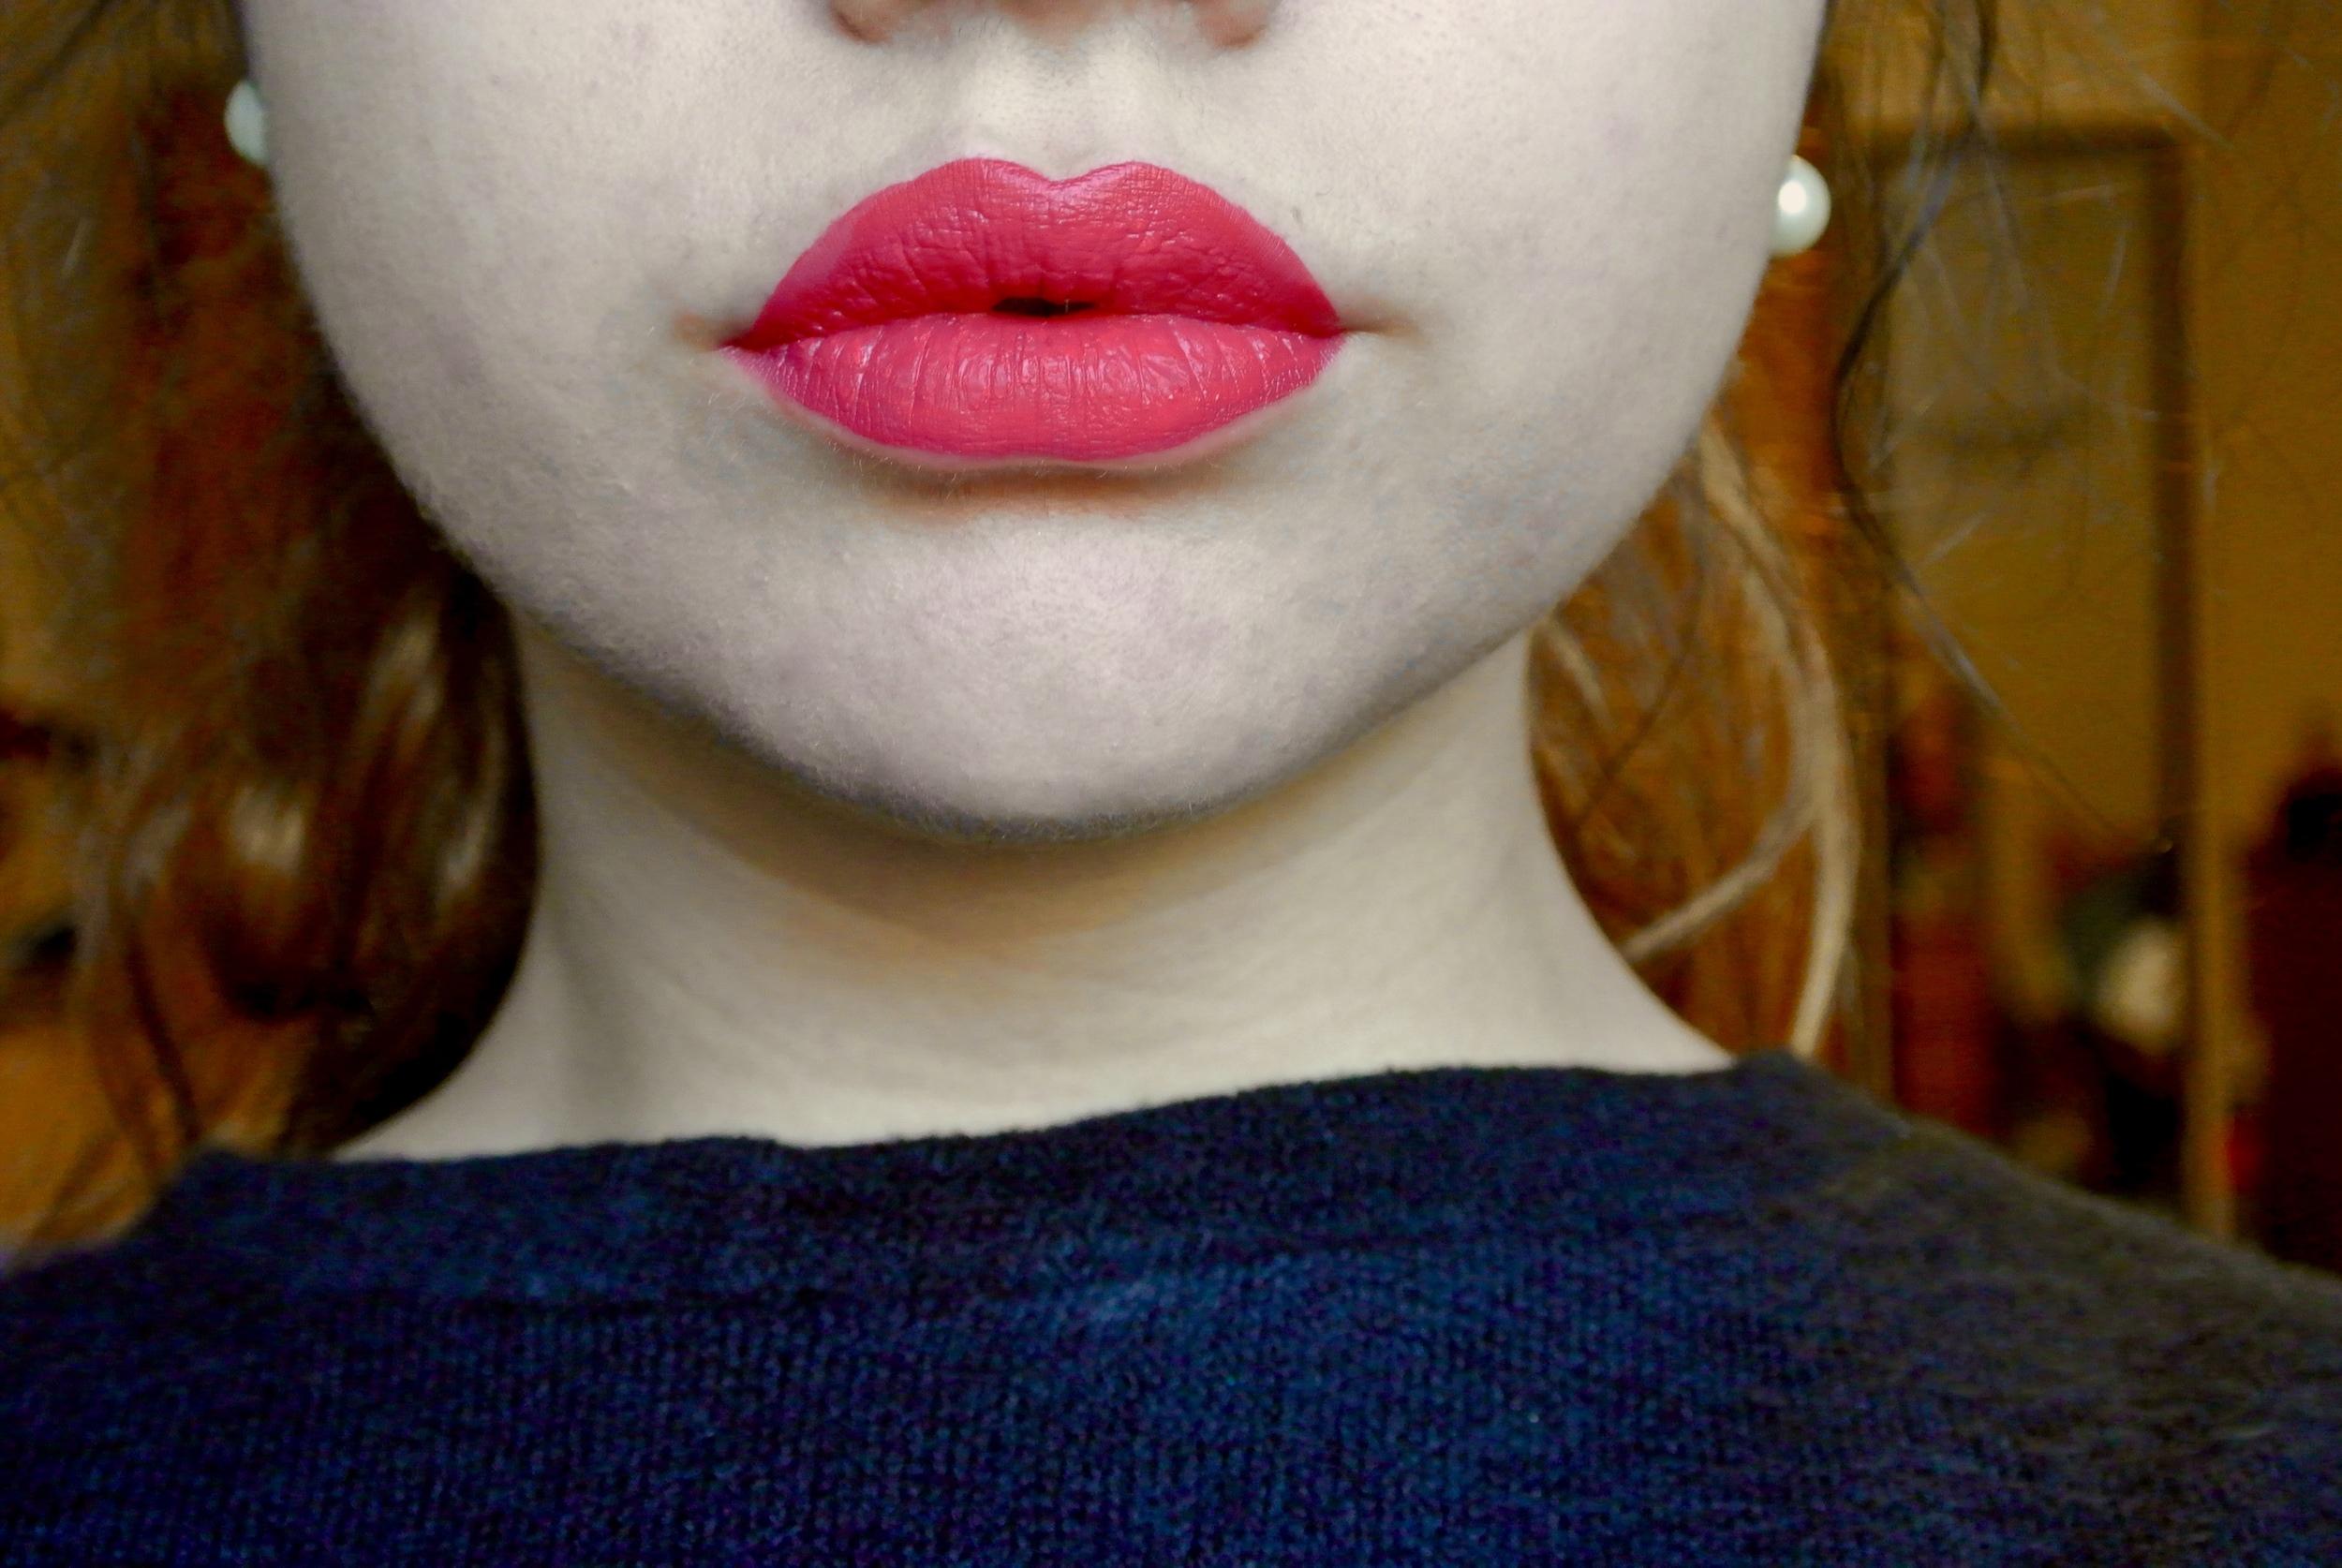 Colourpop Mars Liquid Lipstick